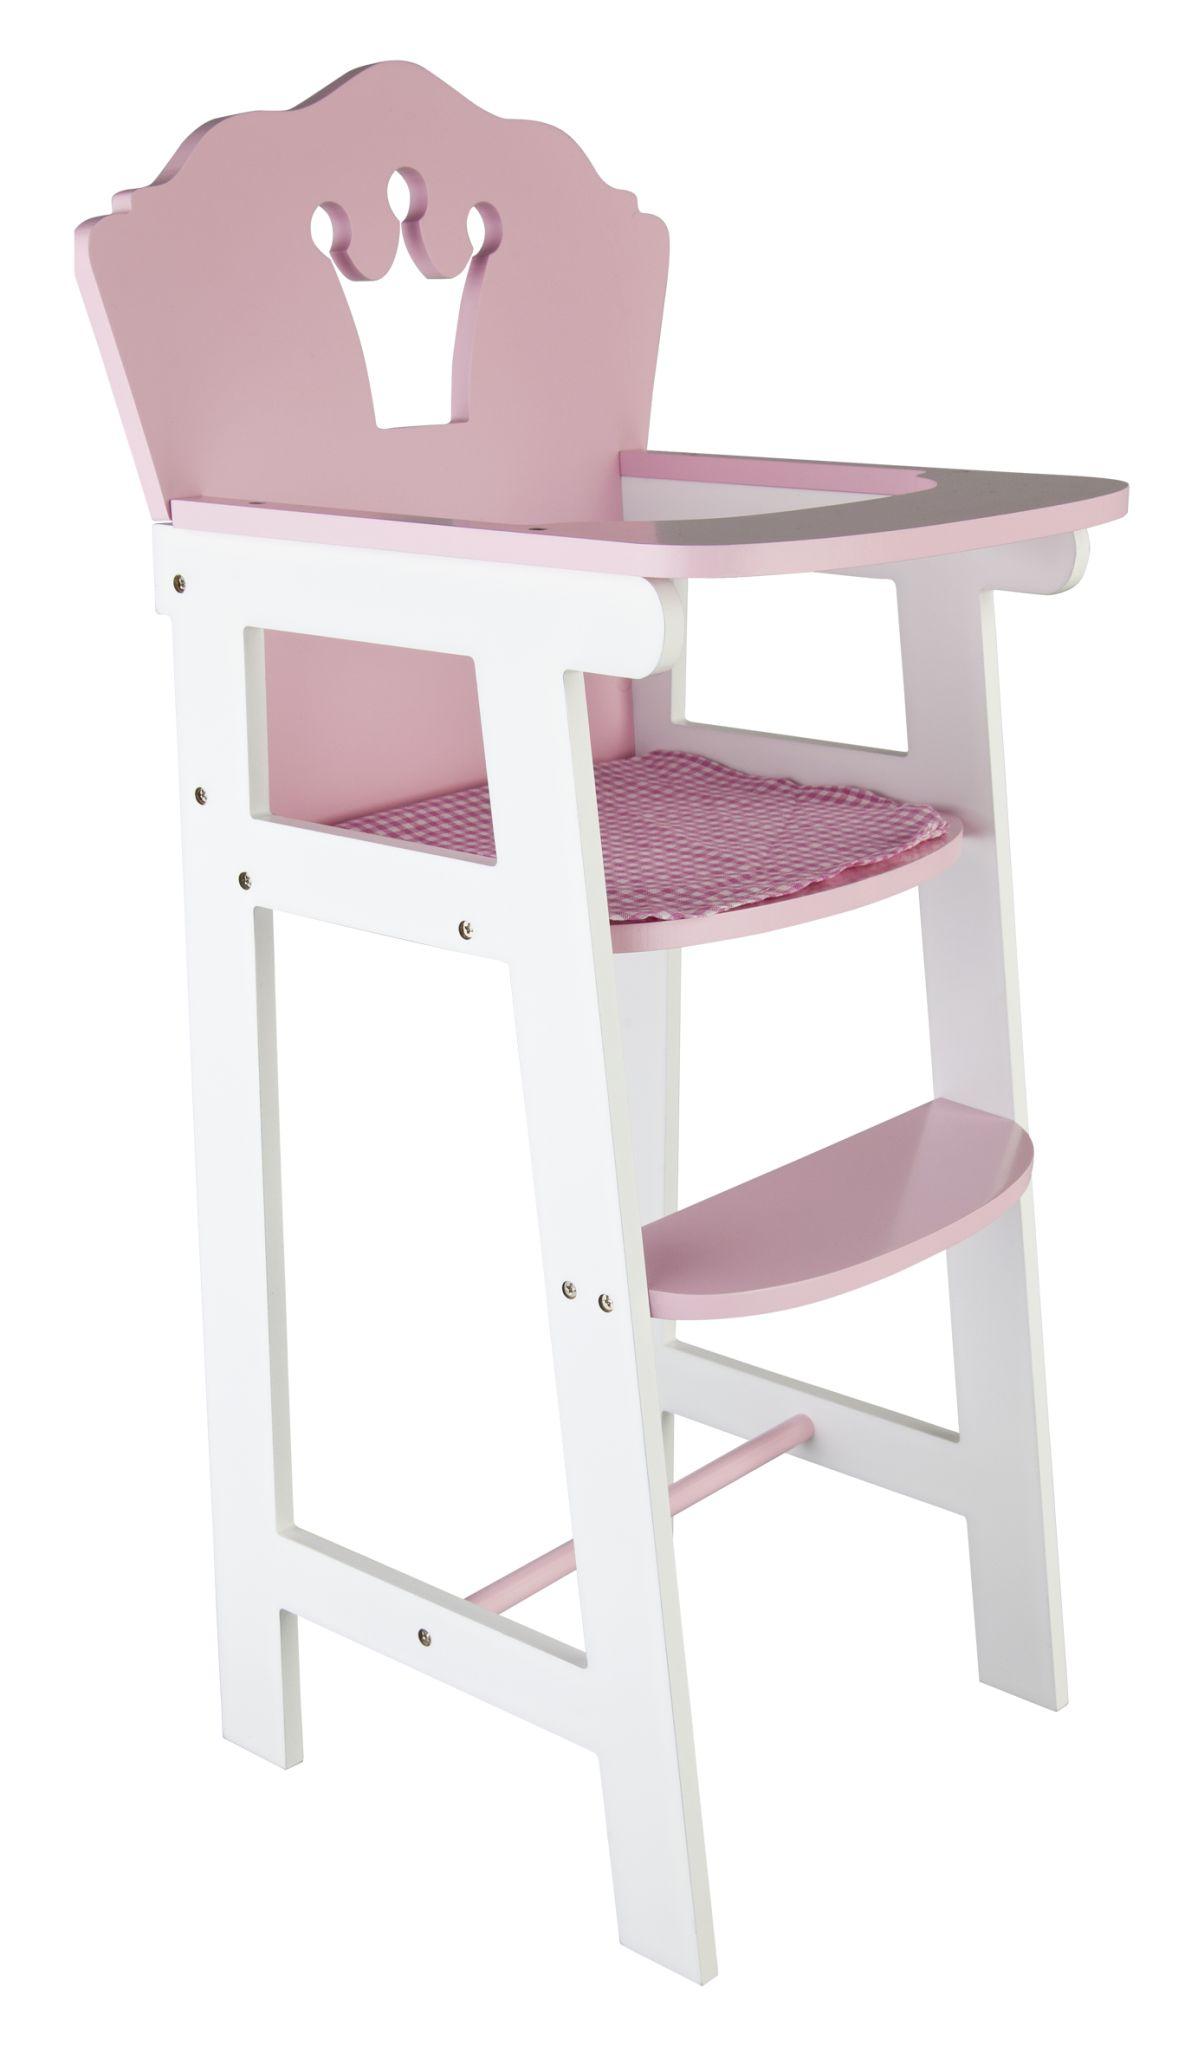 puppenhochstuhl holz rosa wei online kaufen. Black Bedroom Furniture Sets. Home Design Ideas